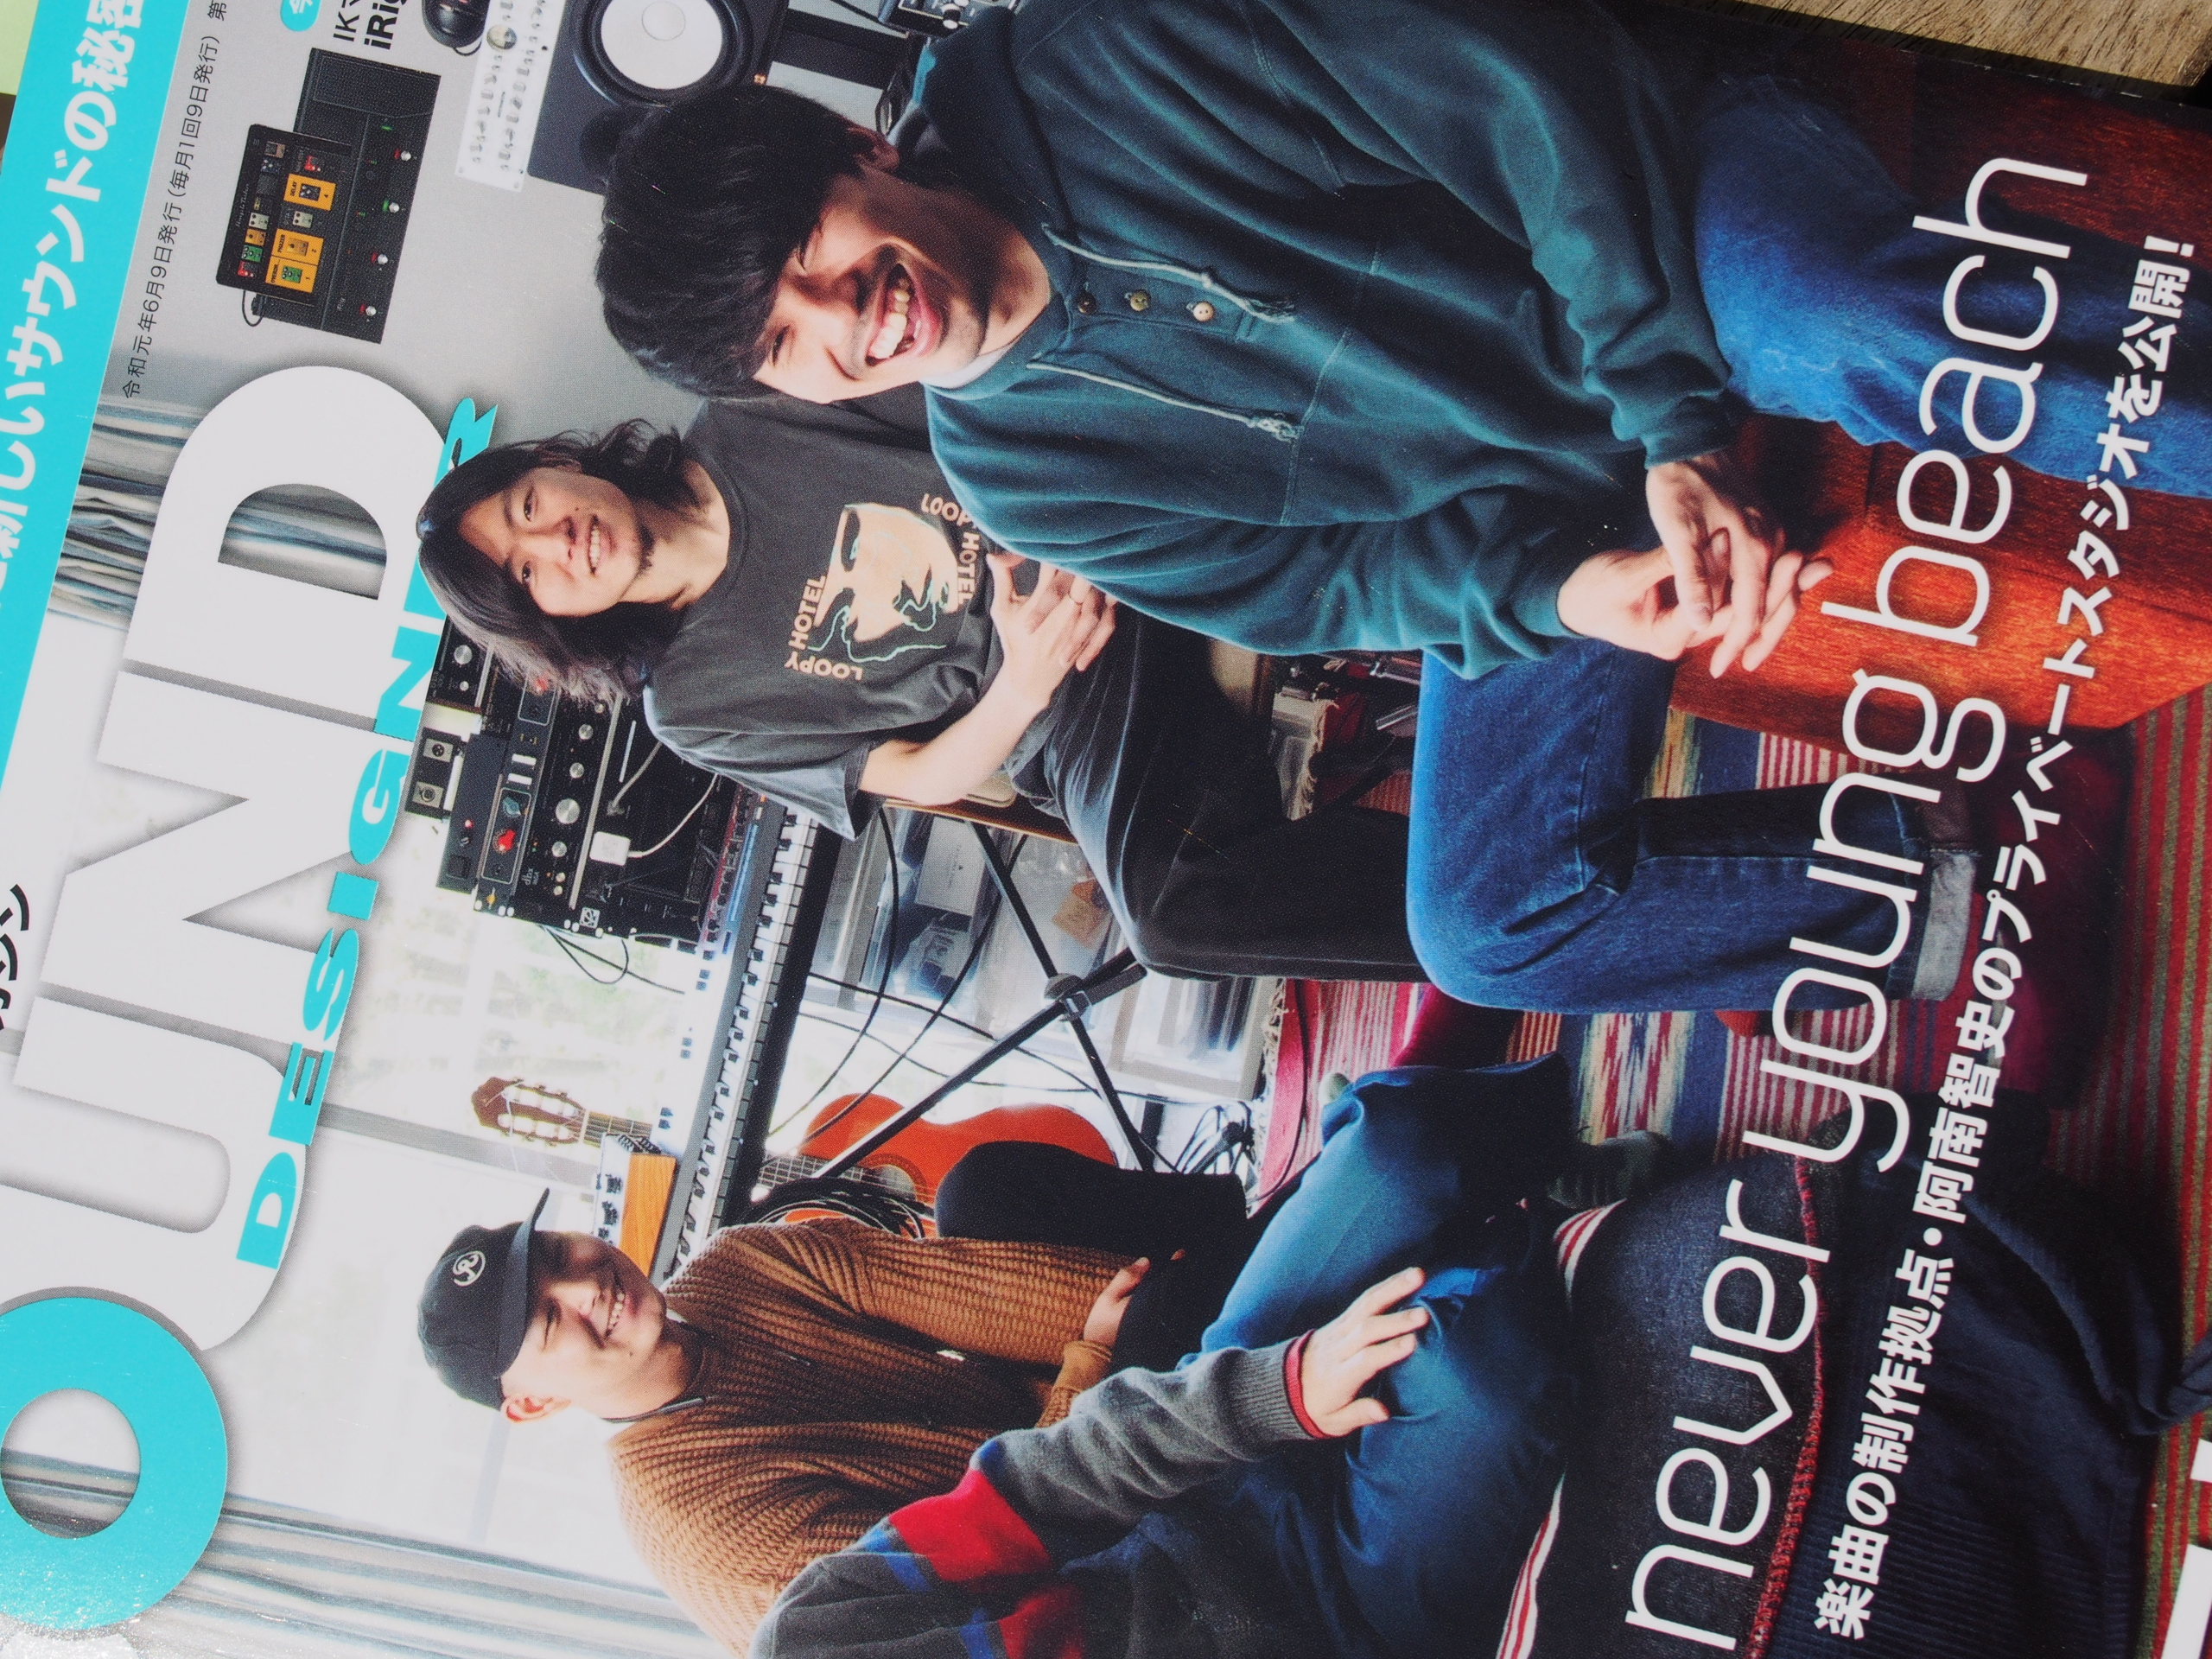 MIDI-CVコンバーター,アナログシンセ,ユーロラック,モジュラーシンセ,自動チューニング,オートチューン,BASTL INSTRUMENTS,1983,レビュー